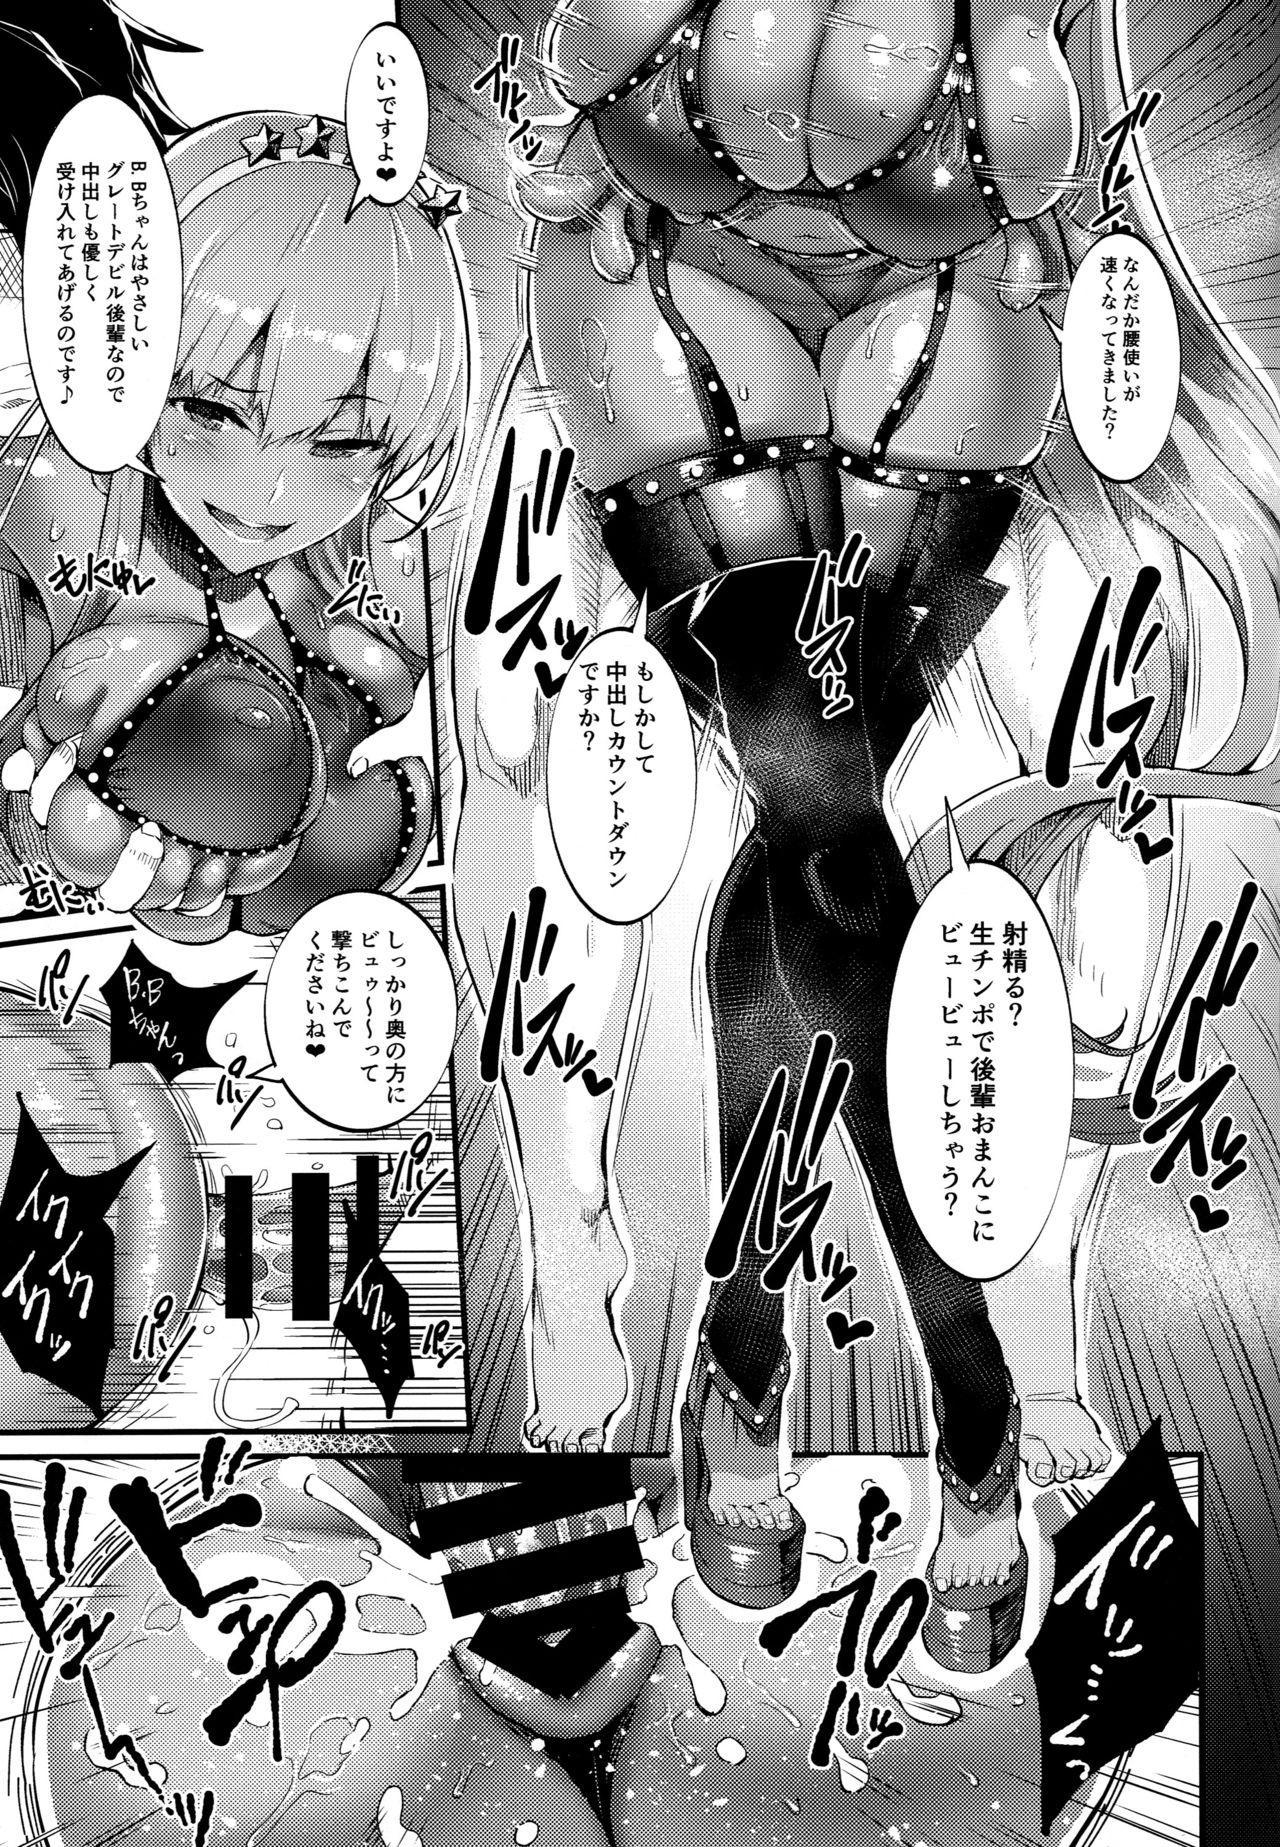 Kagirinaku Toumei ni Chikai B.B - Almost Transparent B,B 19